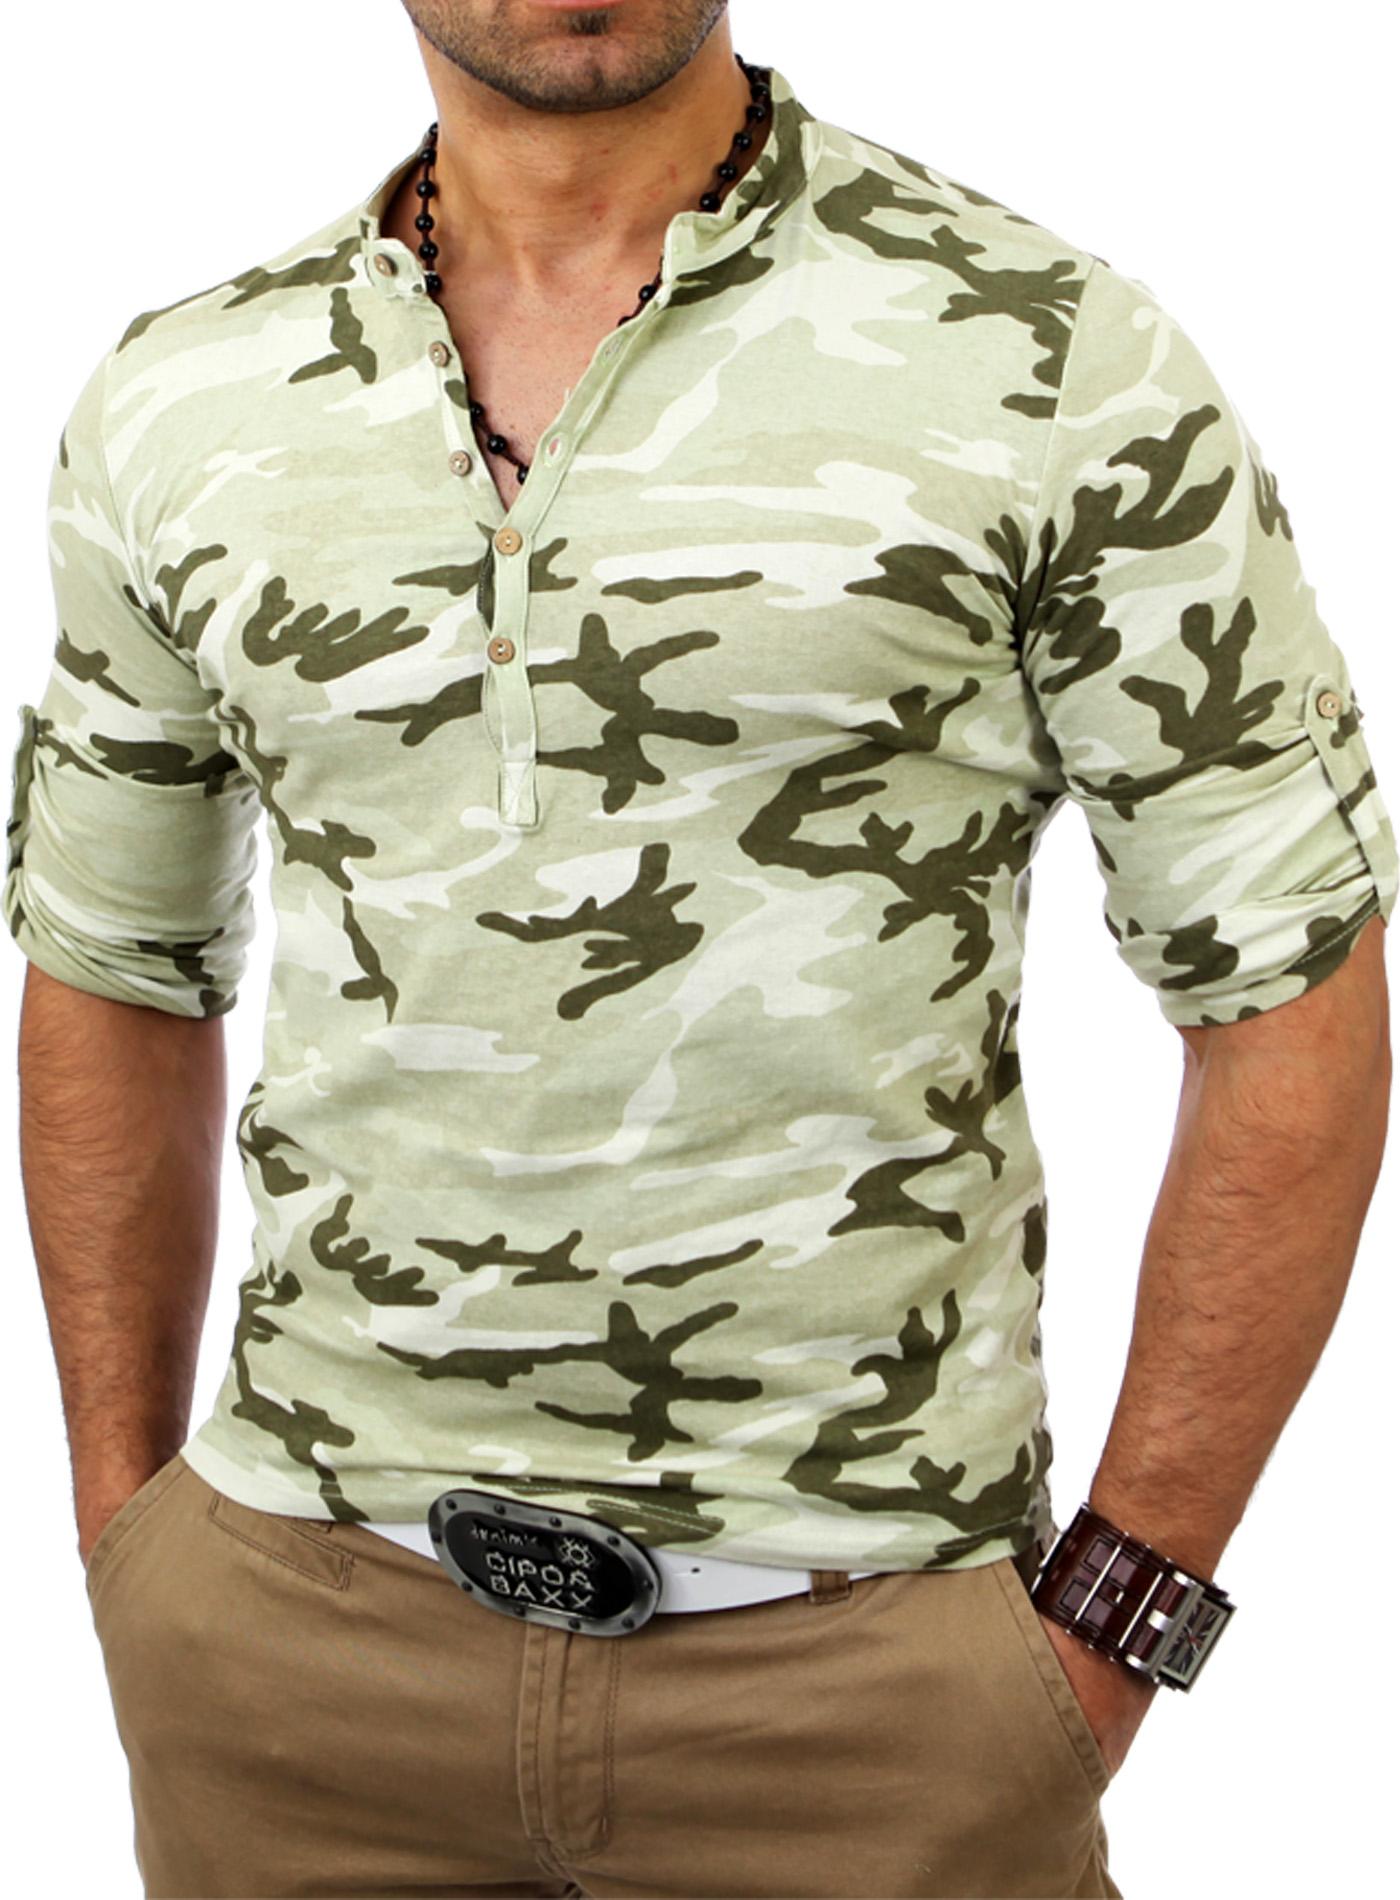 kickdown herren camouflage longsleeve longshirt t shirt hemd k 2478 ebay. Black Bedroom Furniture Sets. Home Design Ideas